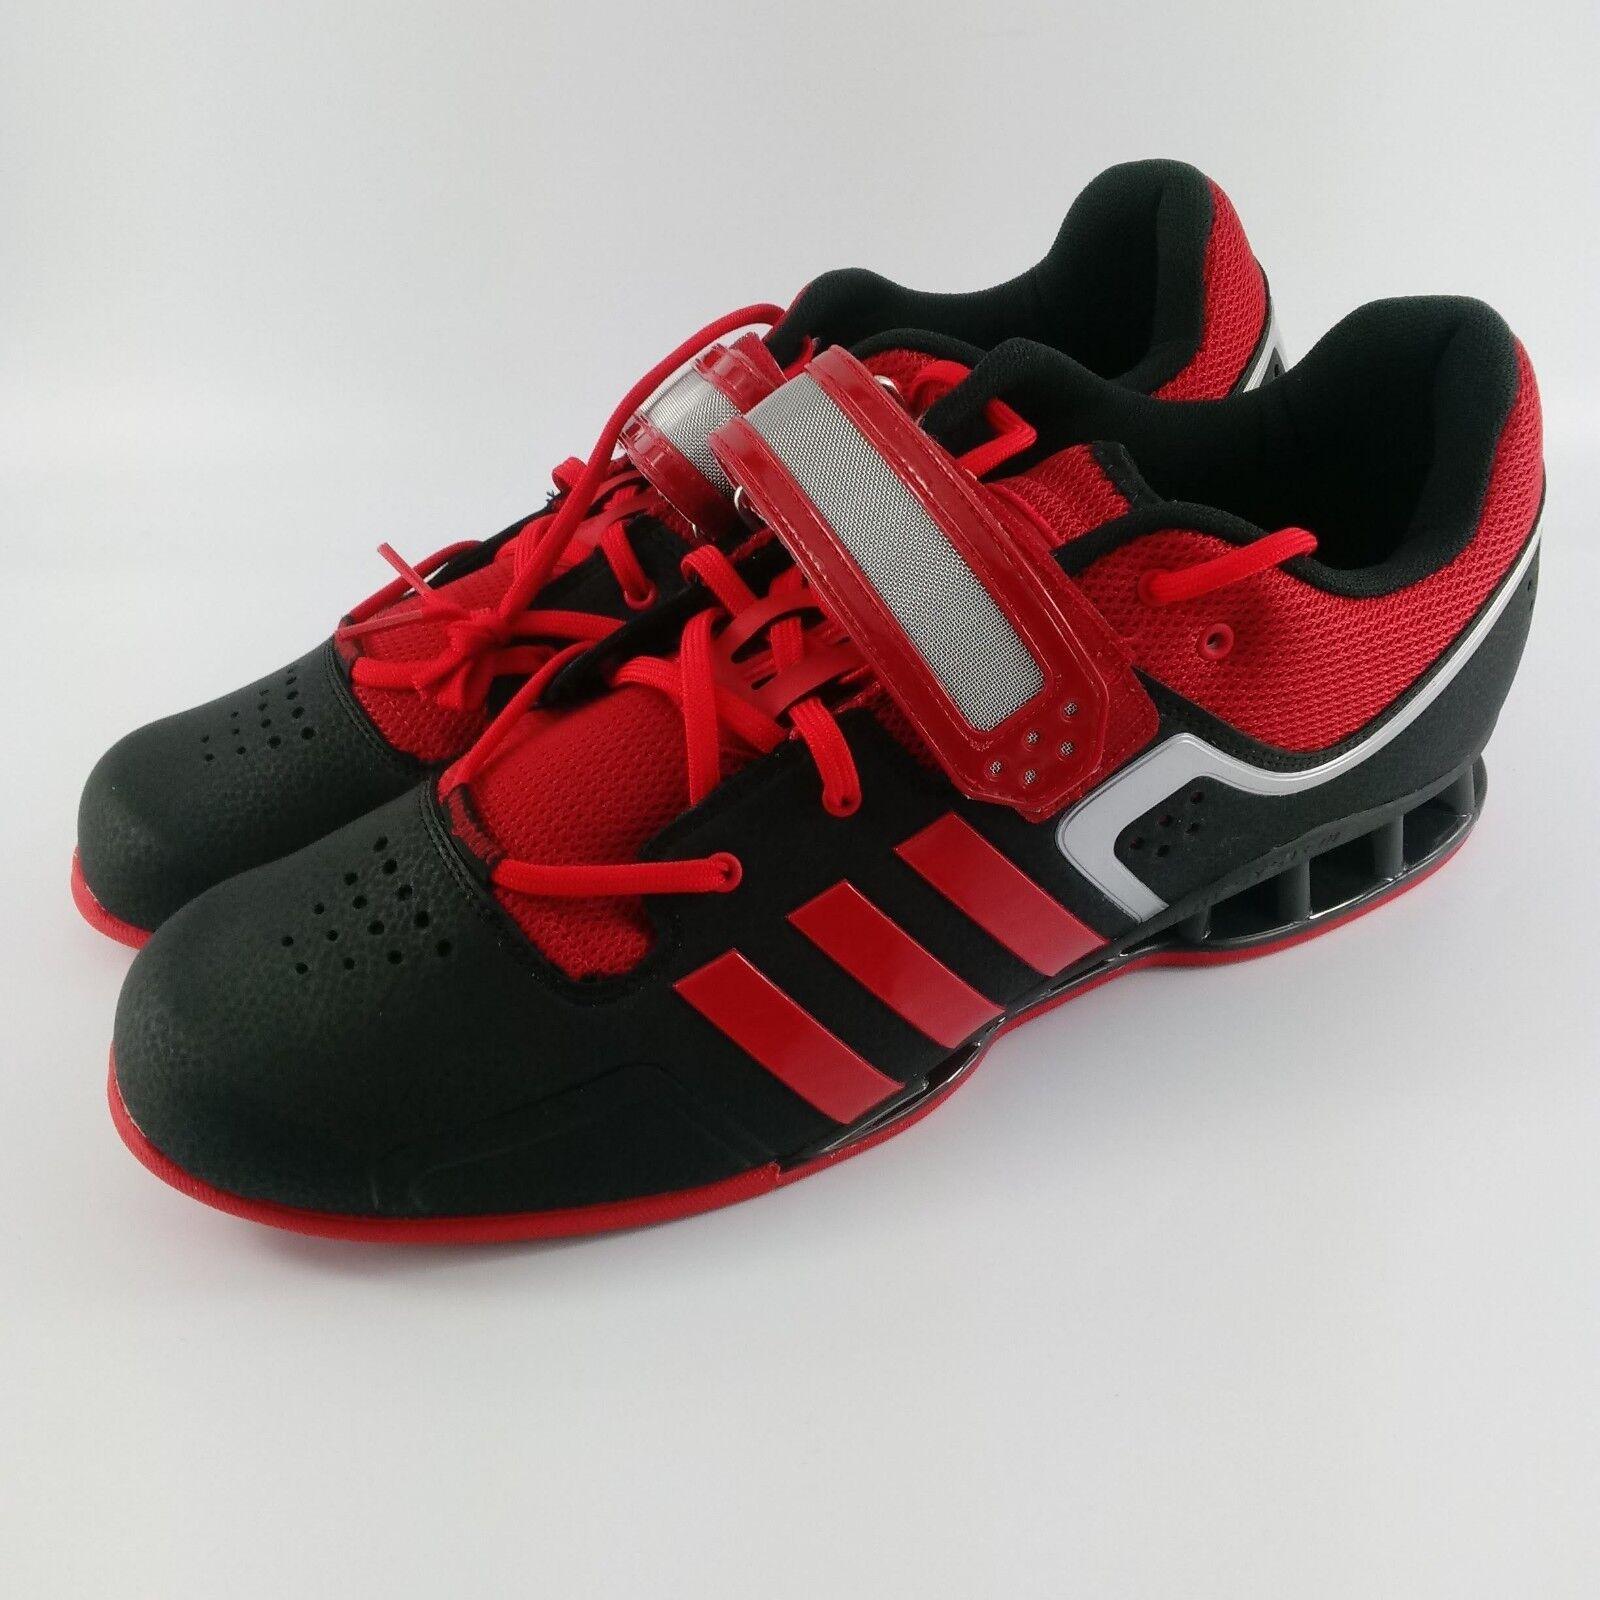 Adidas adipower weighlifting rosso scarpe - nero / rosso weighlifting - m21865 - dimensioni: 15 6e07a8